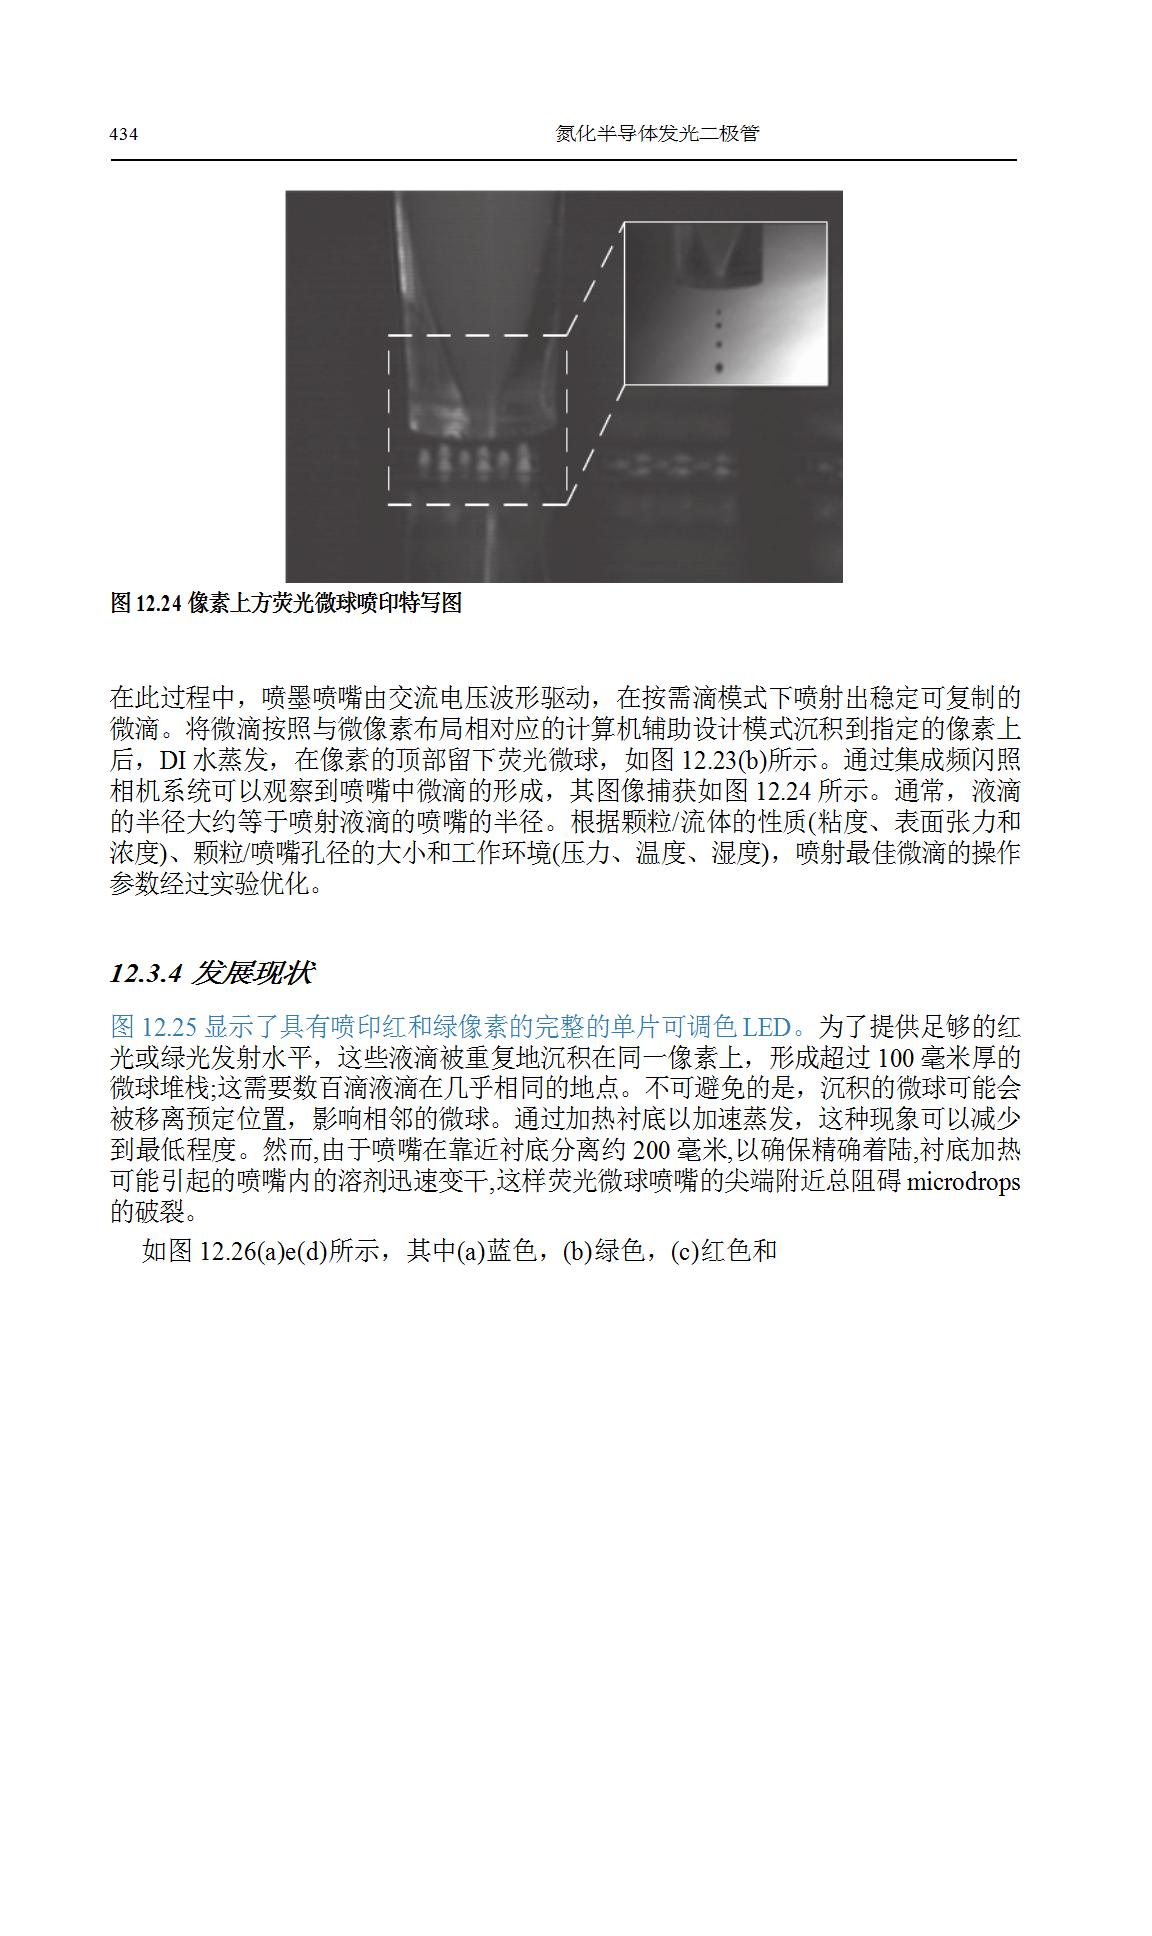 LED调色和像素化MicroLED阵列研究  第20张